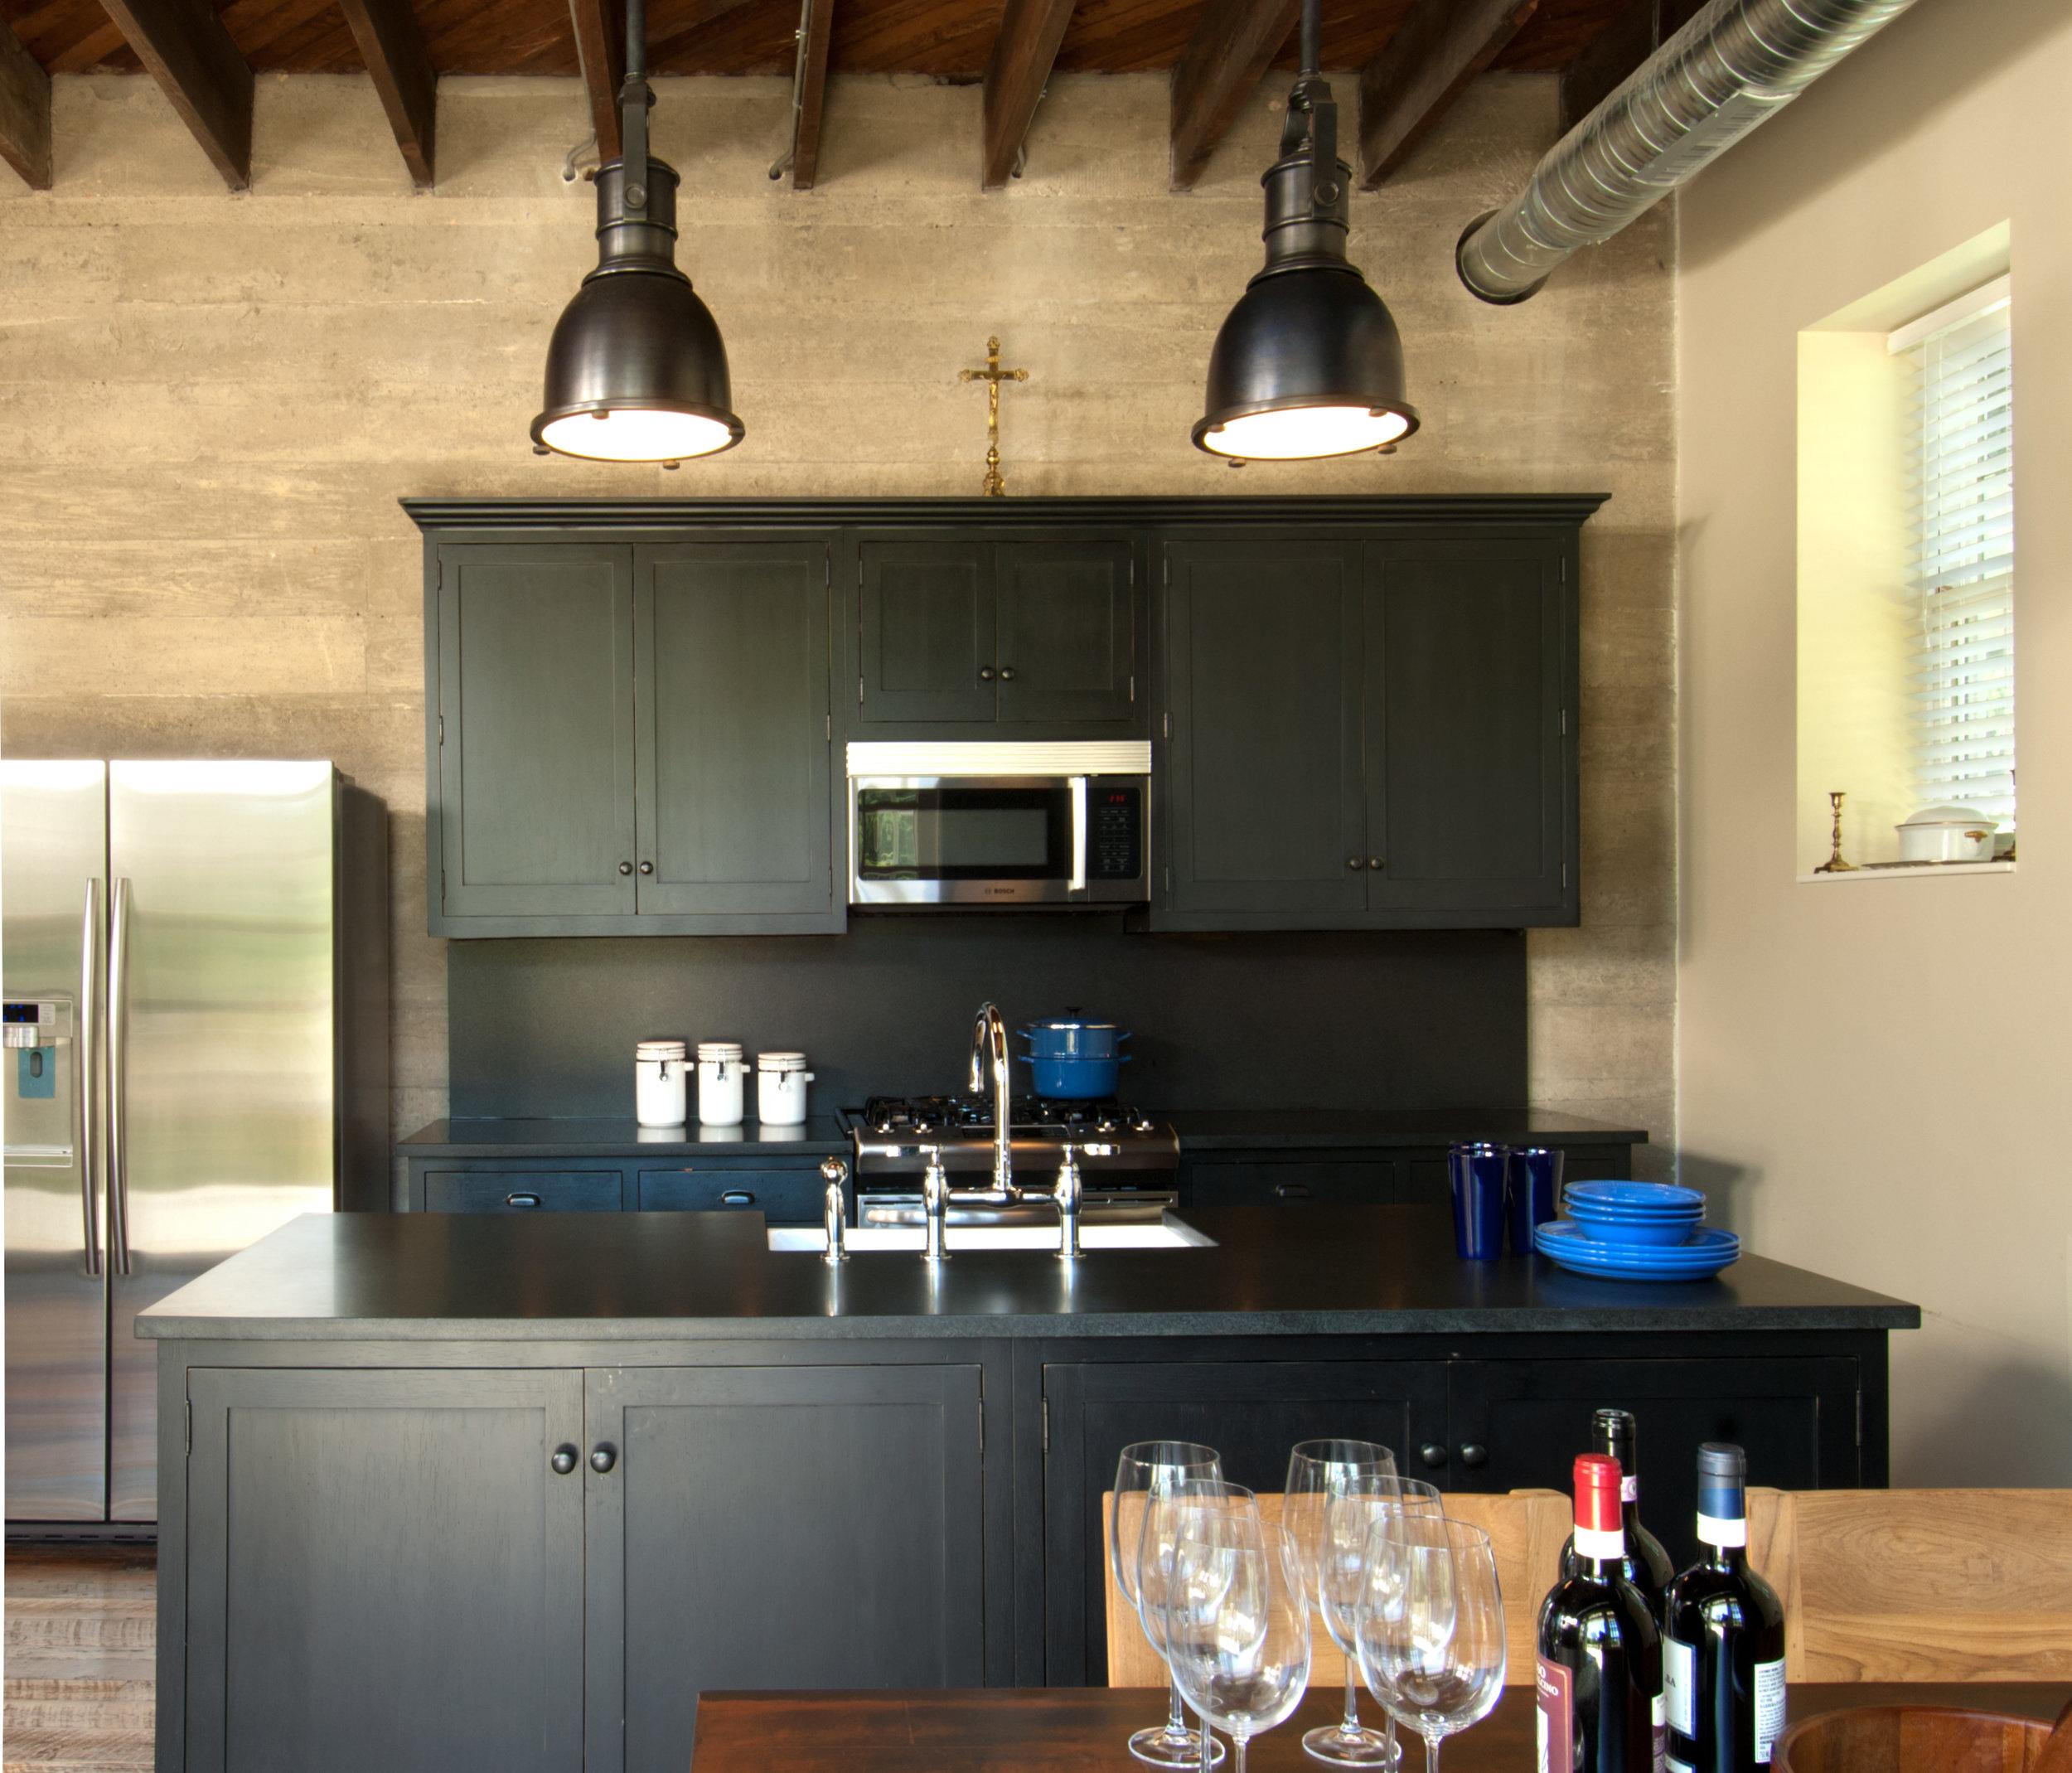 06-Colombiere-kitchen.jpg